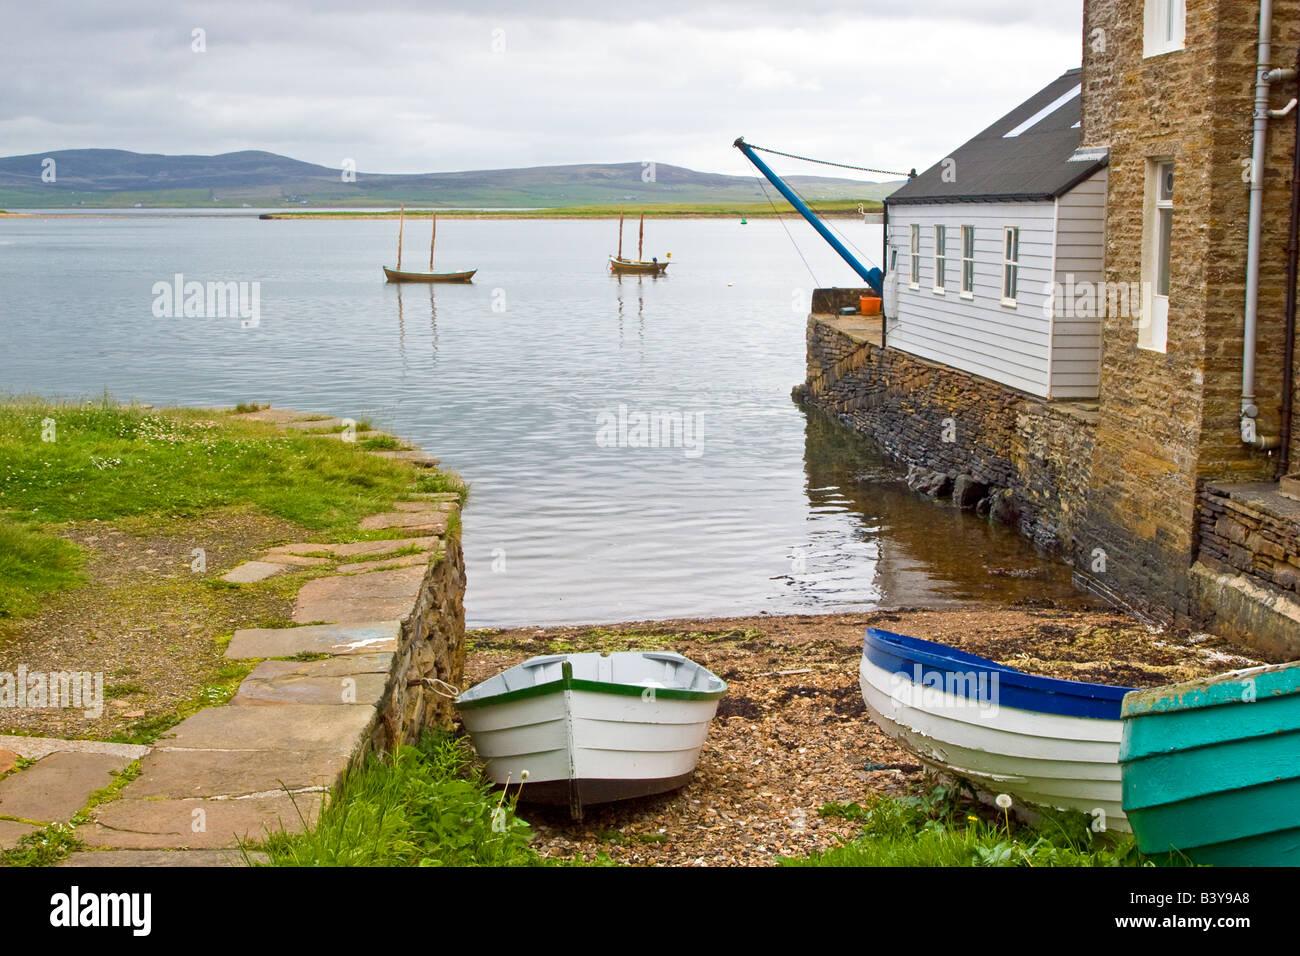 Fishing boats on a stone slipway, Stromness, Orkney Isle, Scotland UK 2008 - Stock Image